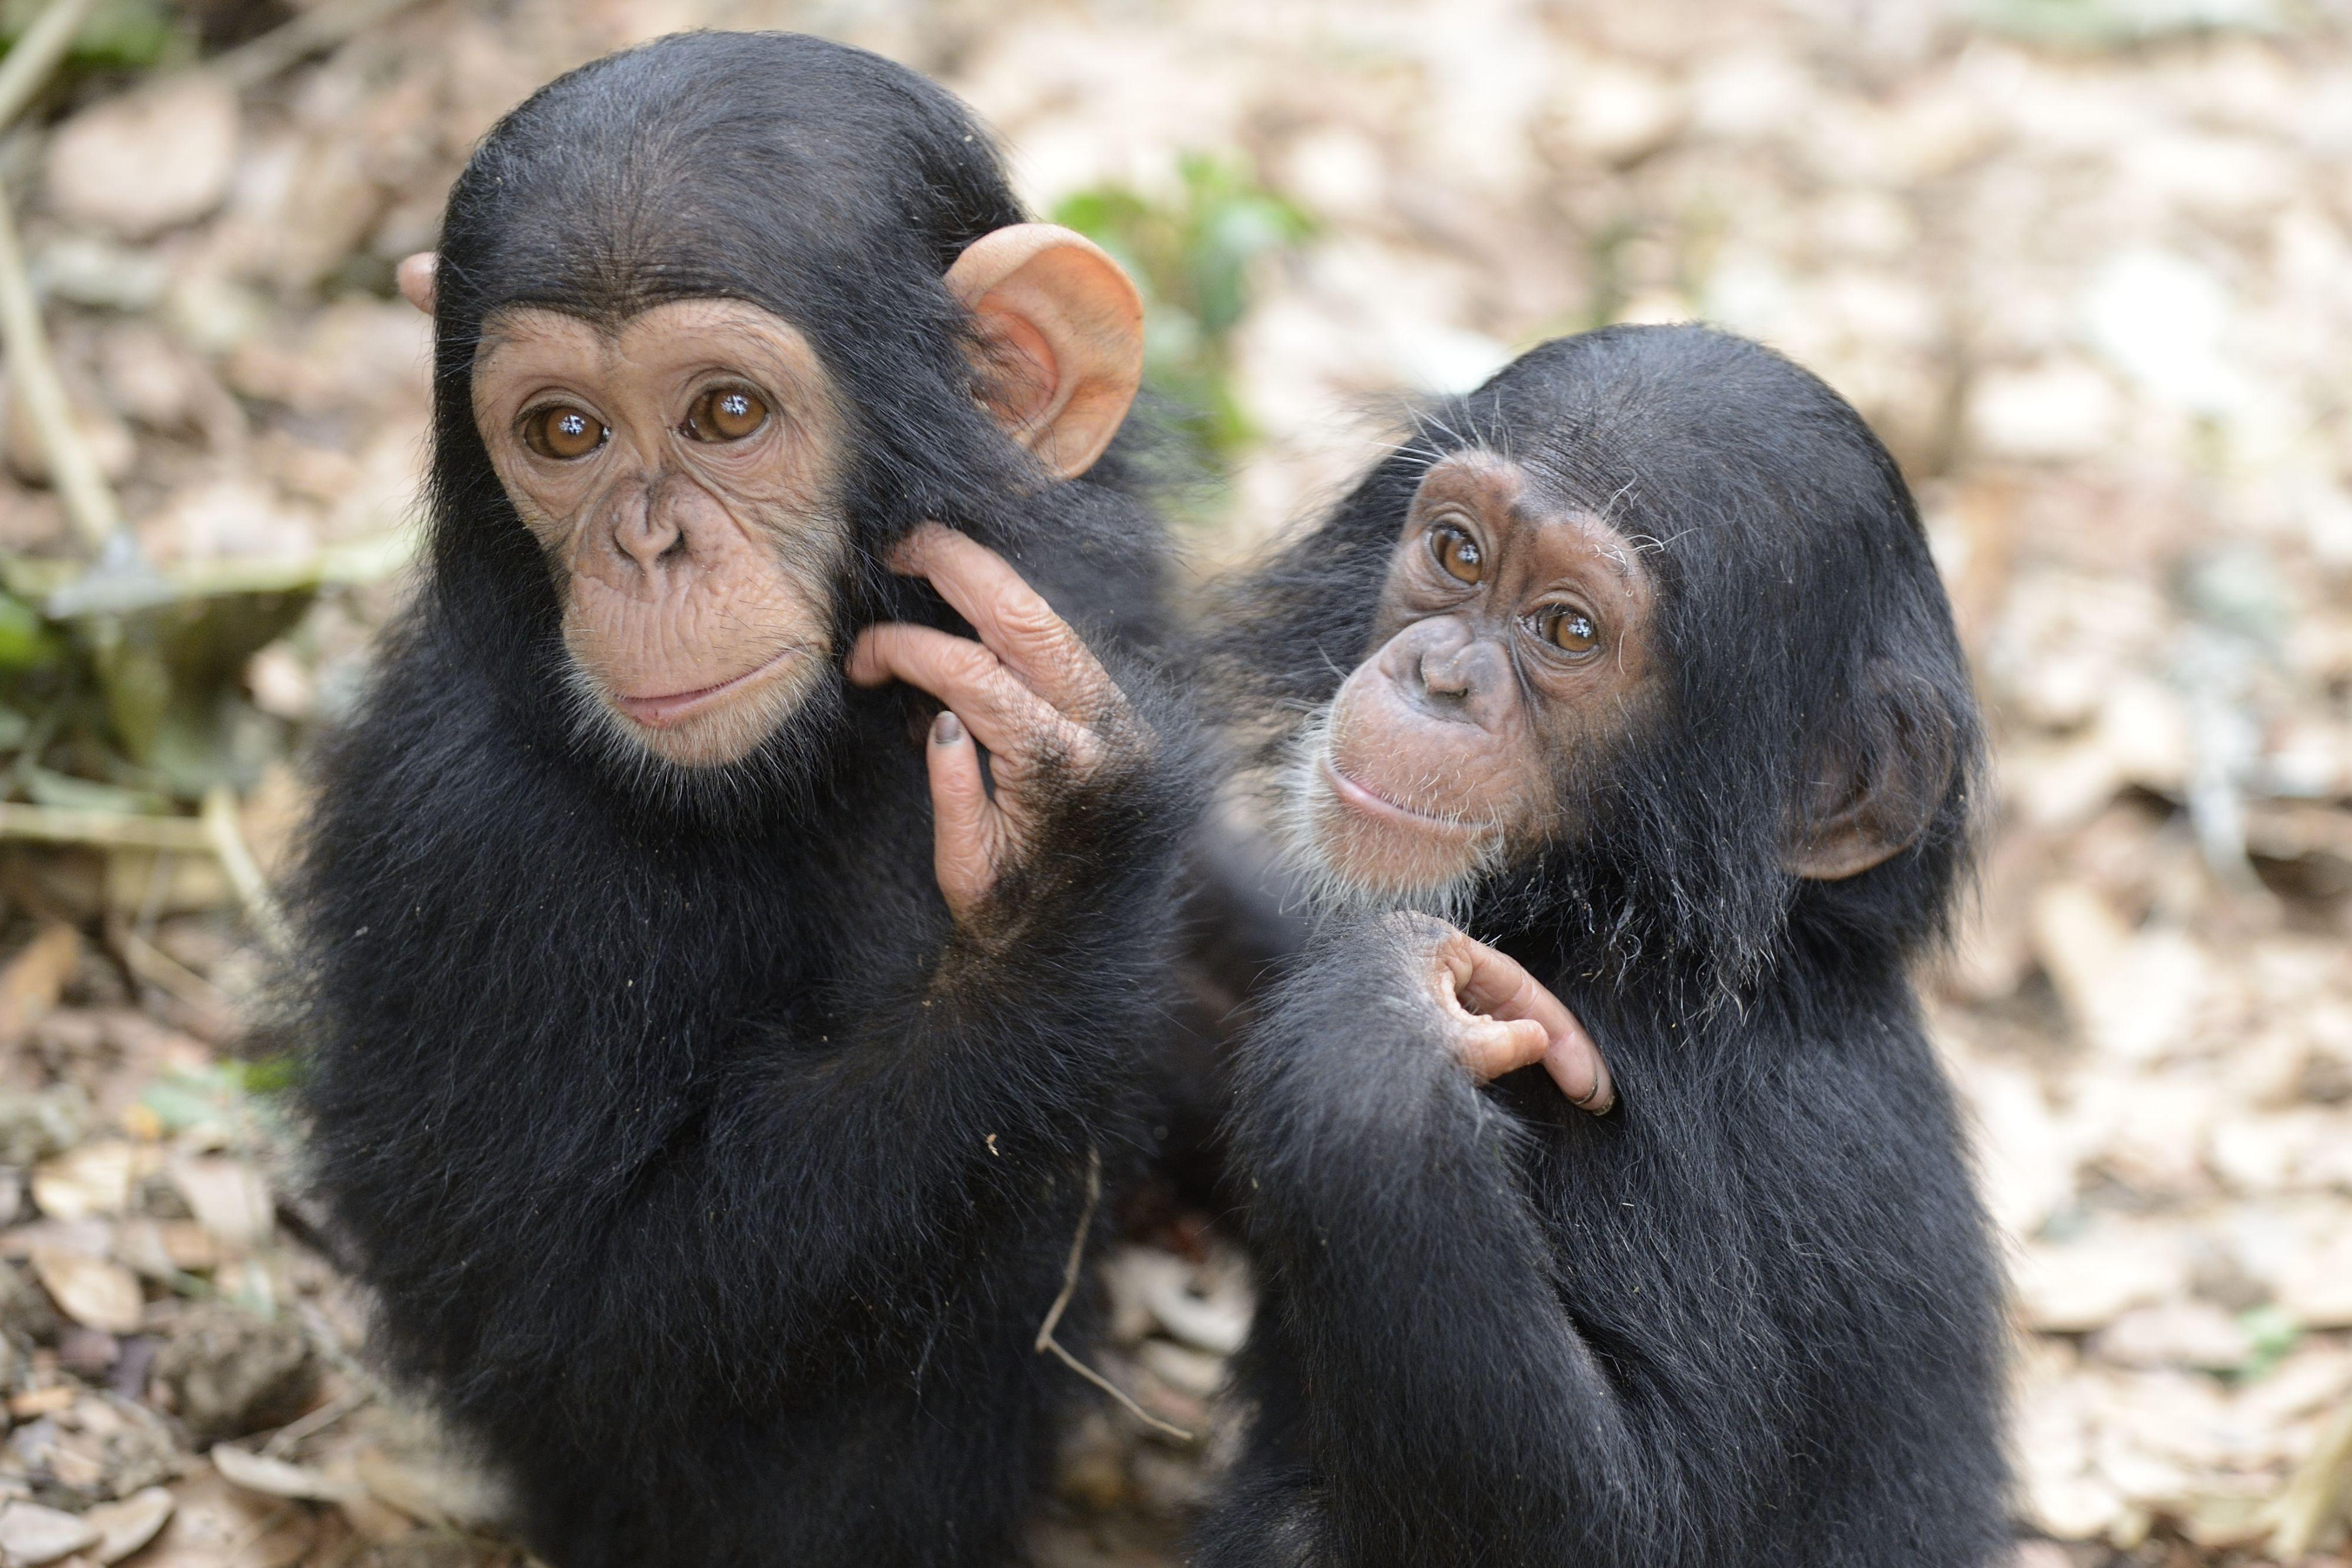 IDA-Africa's Sanaga-Yong Chimpanzee Rescue Center is